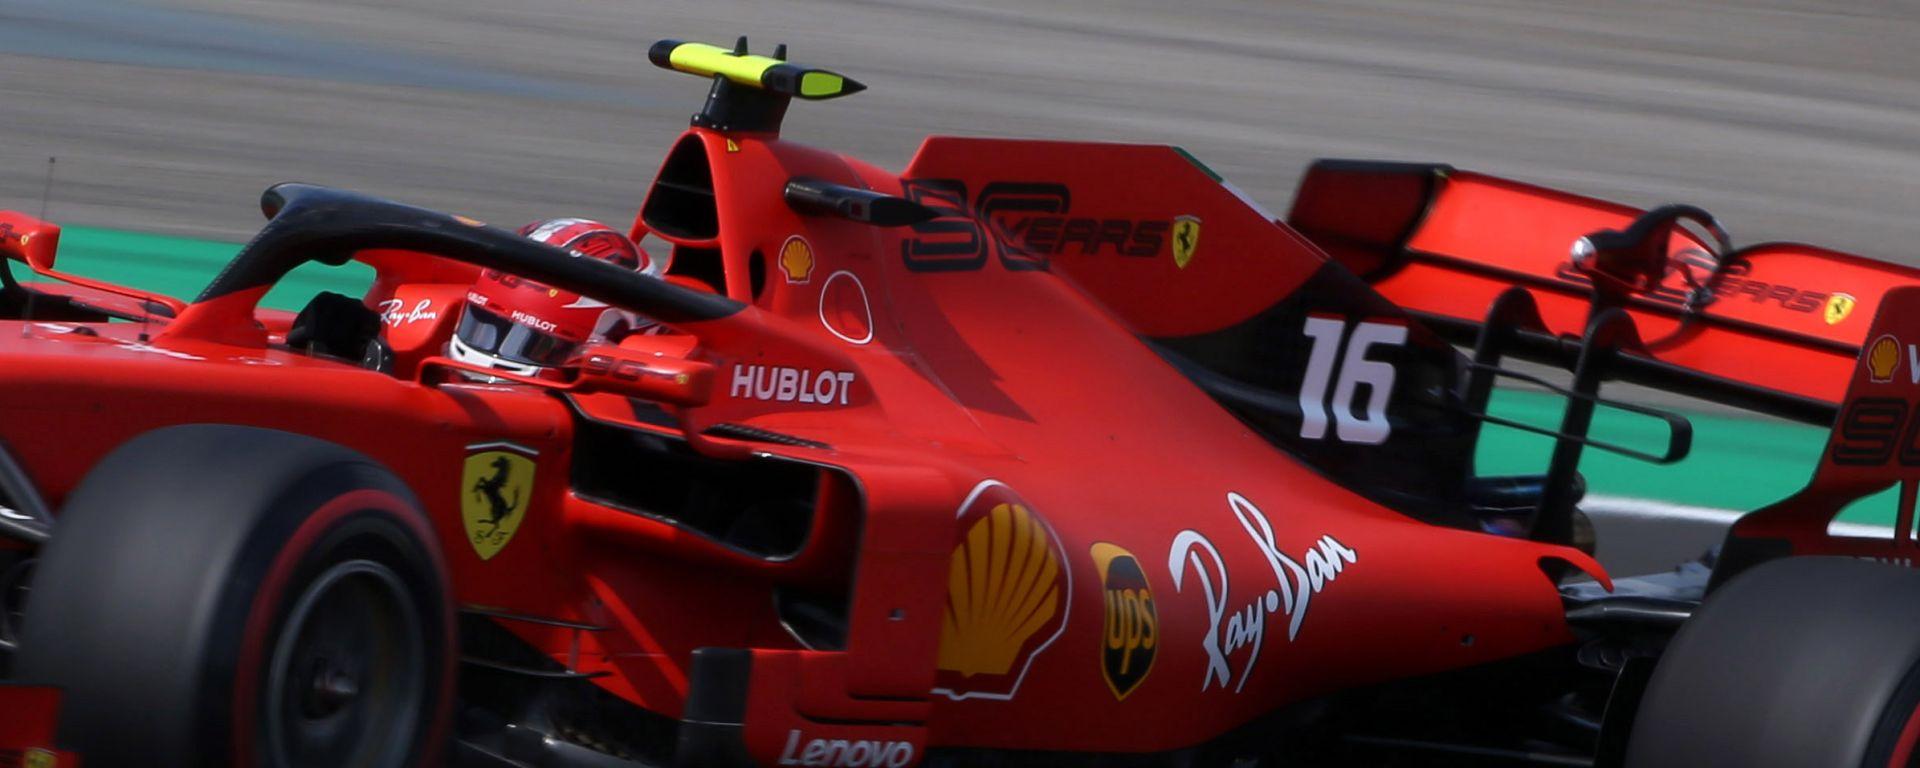 F1 GP Ungheria 2019, Hungaroring (Budapest), Charles Leclerc (Ferrari)